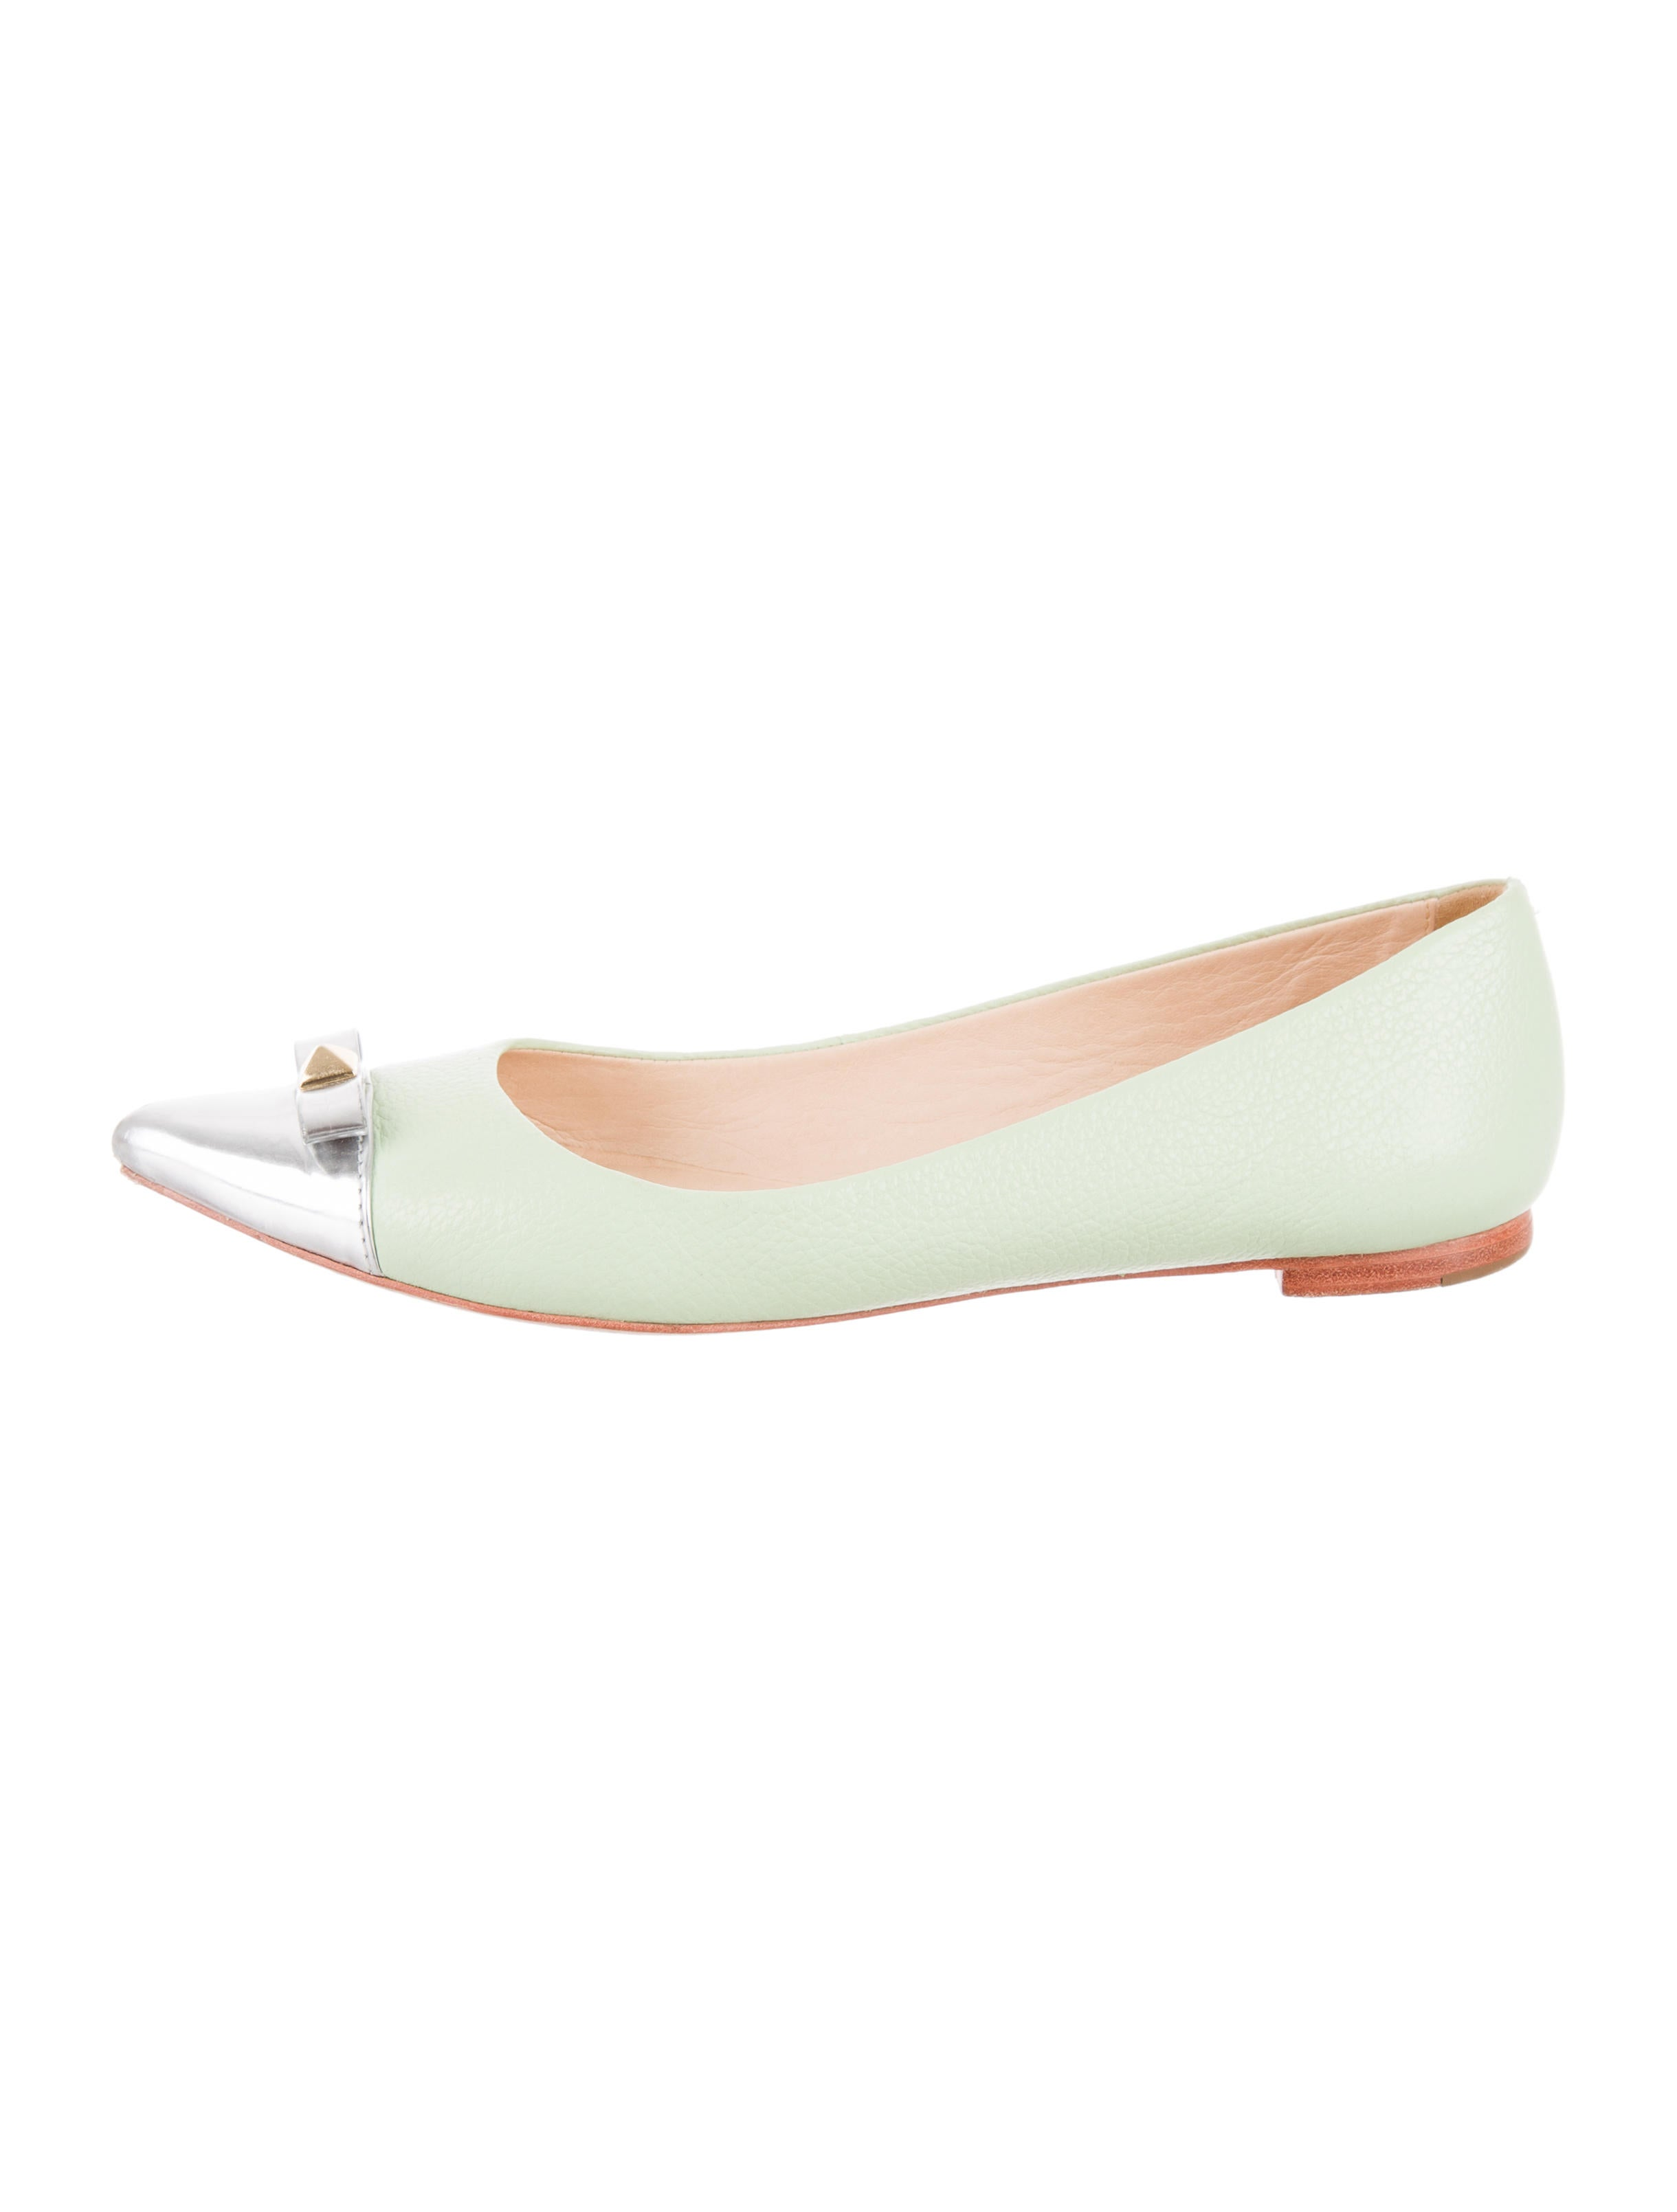 Kate spade new york ginny too cap toe flats shoes for Kate spade new york flats